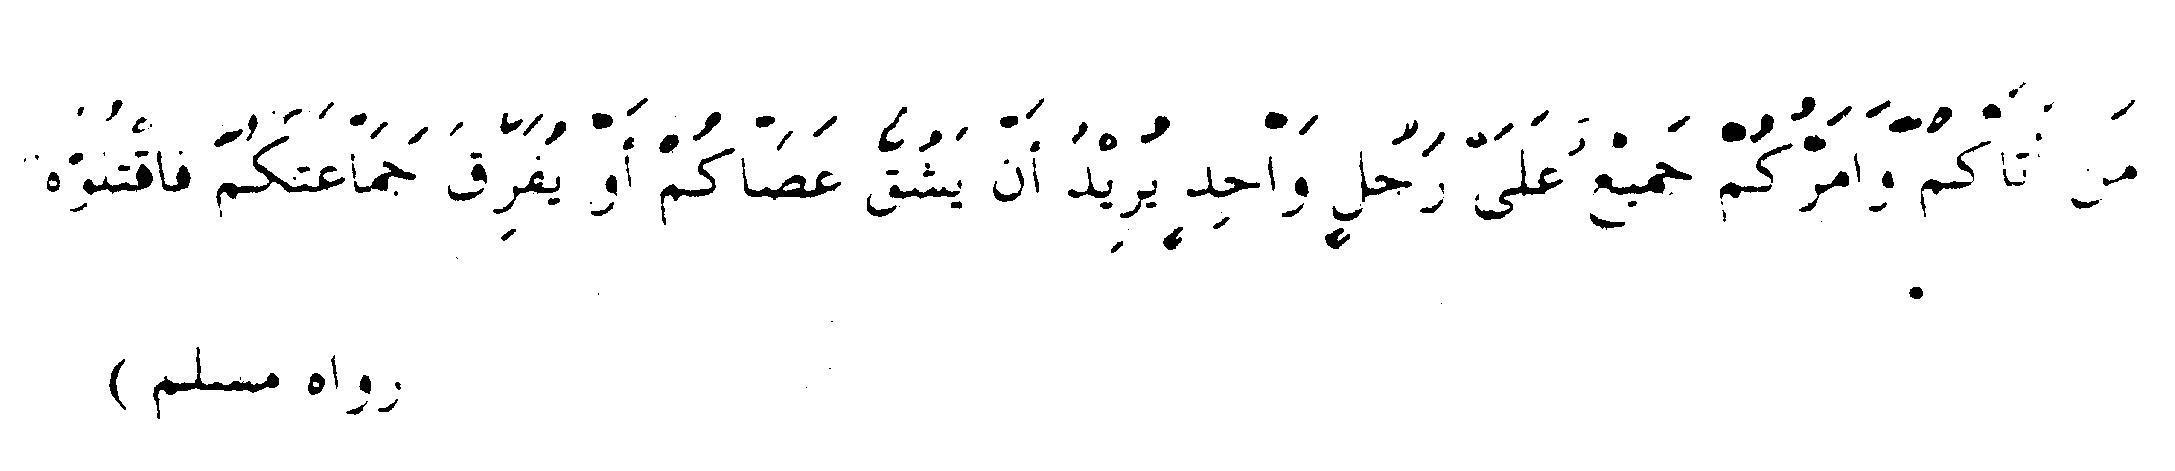 islam8.jpg (78234 bytes)